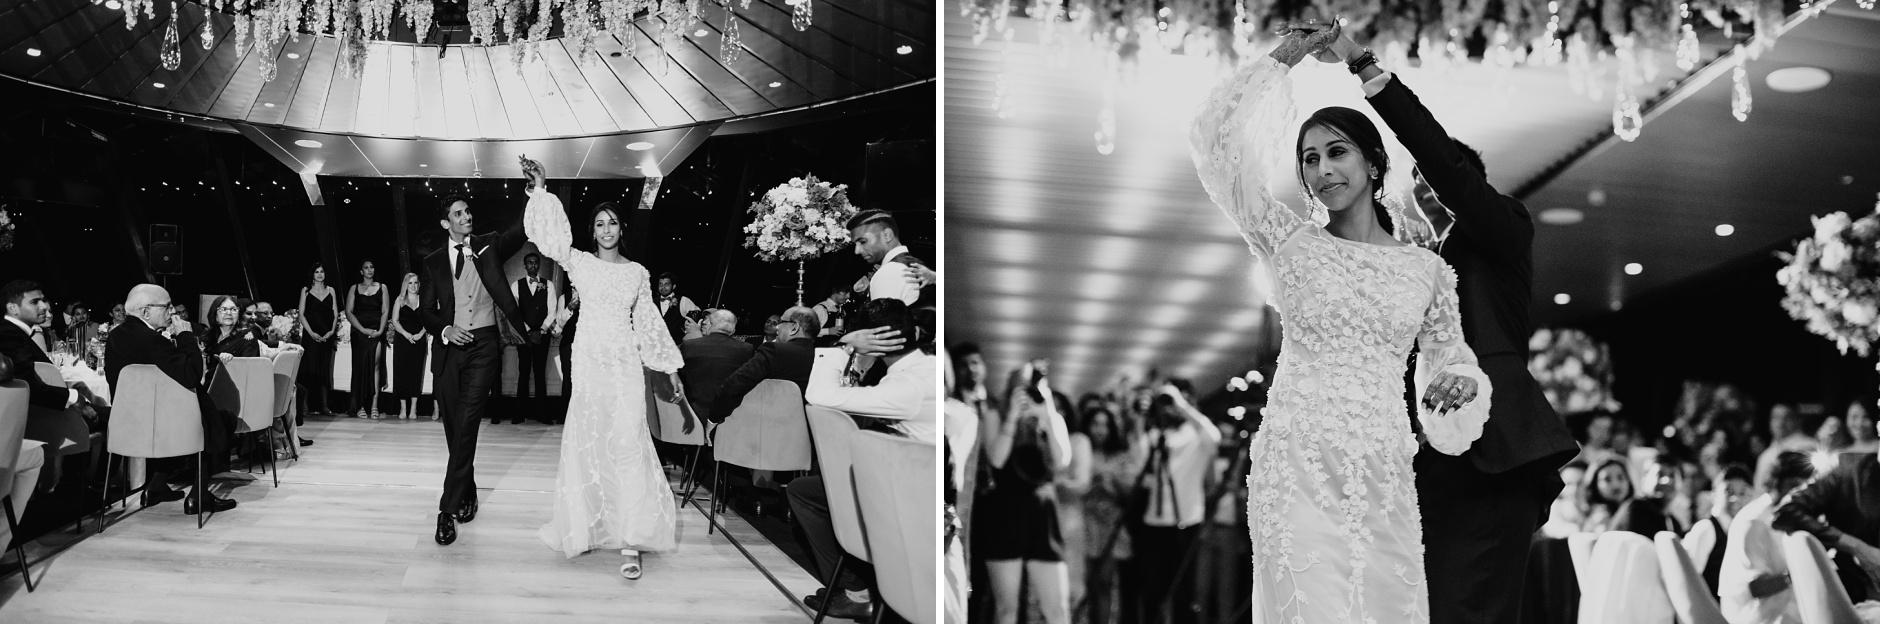 brahman&priyanka2091b_Byron-Bay-Wedding.jpg